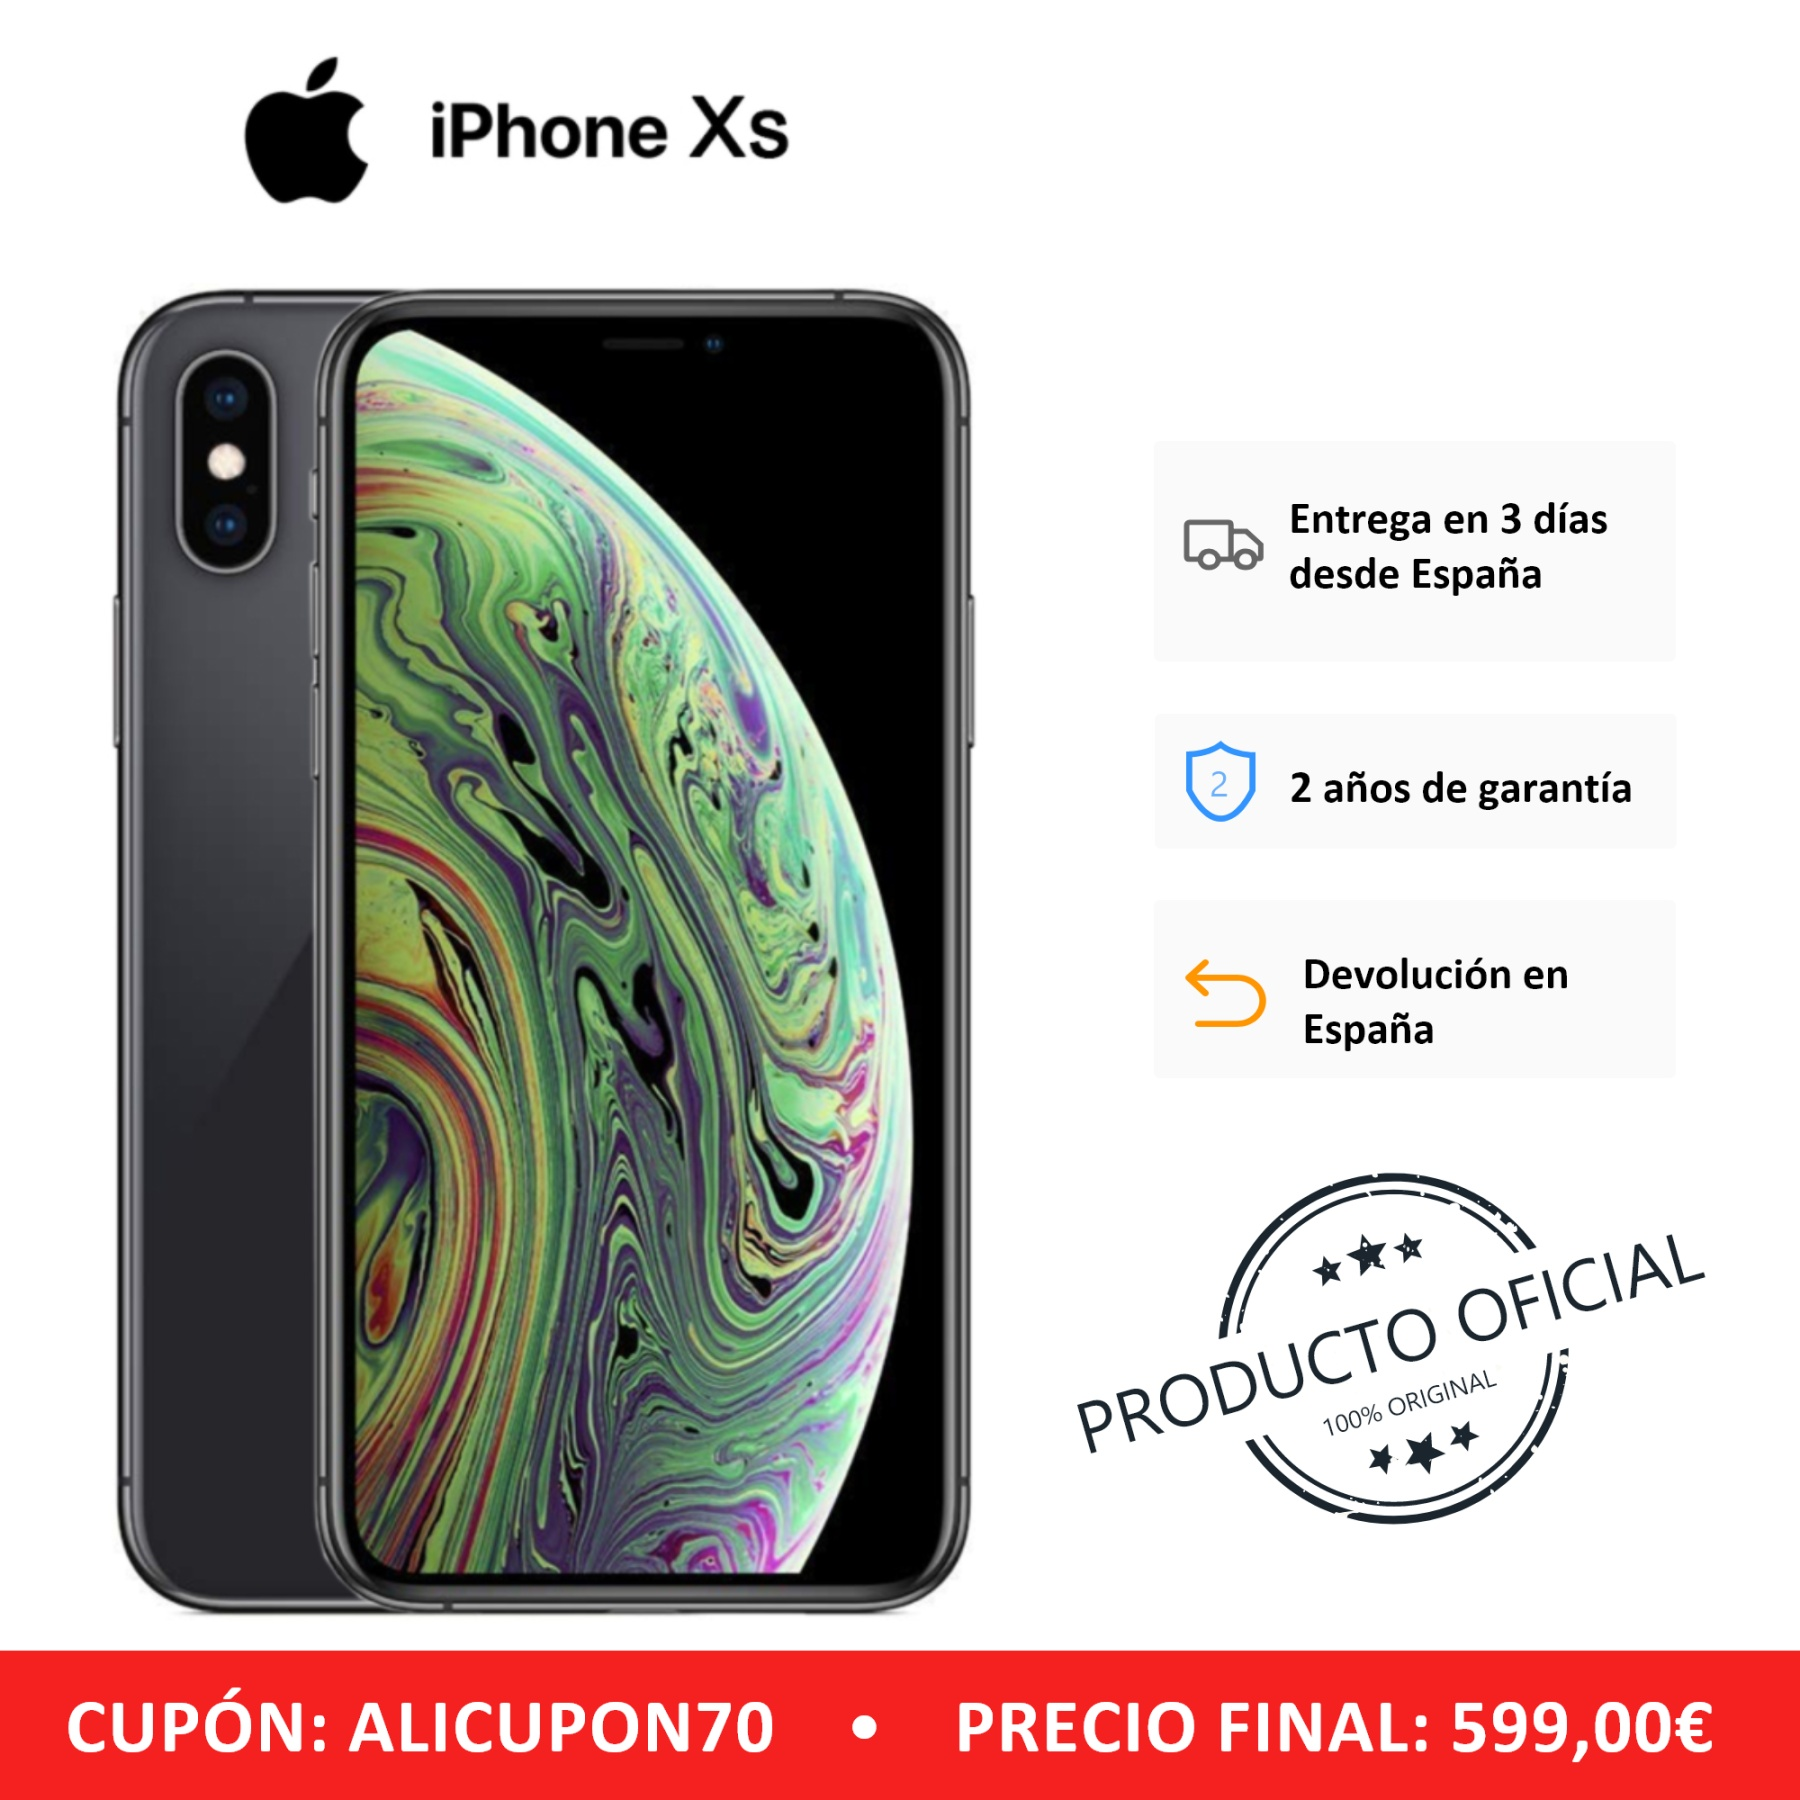 Apple iPhone Xs, Color Gris (Grey), Versión EU. Banda 4G / LTE / Wi-Fi, 64 GB de Memoria interna, 4 GB de RAM, Pantalla